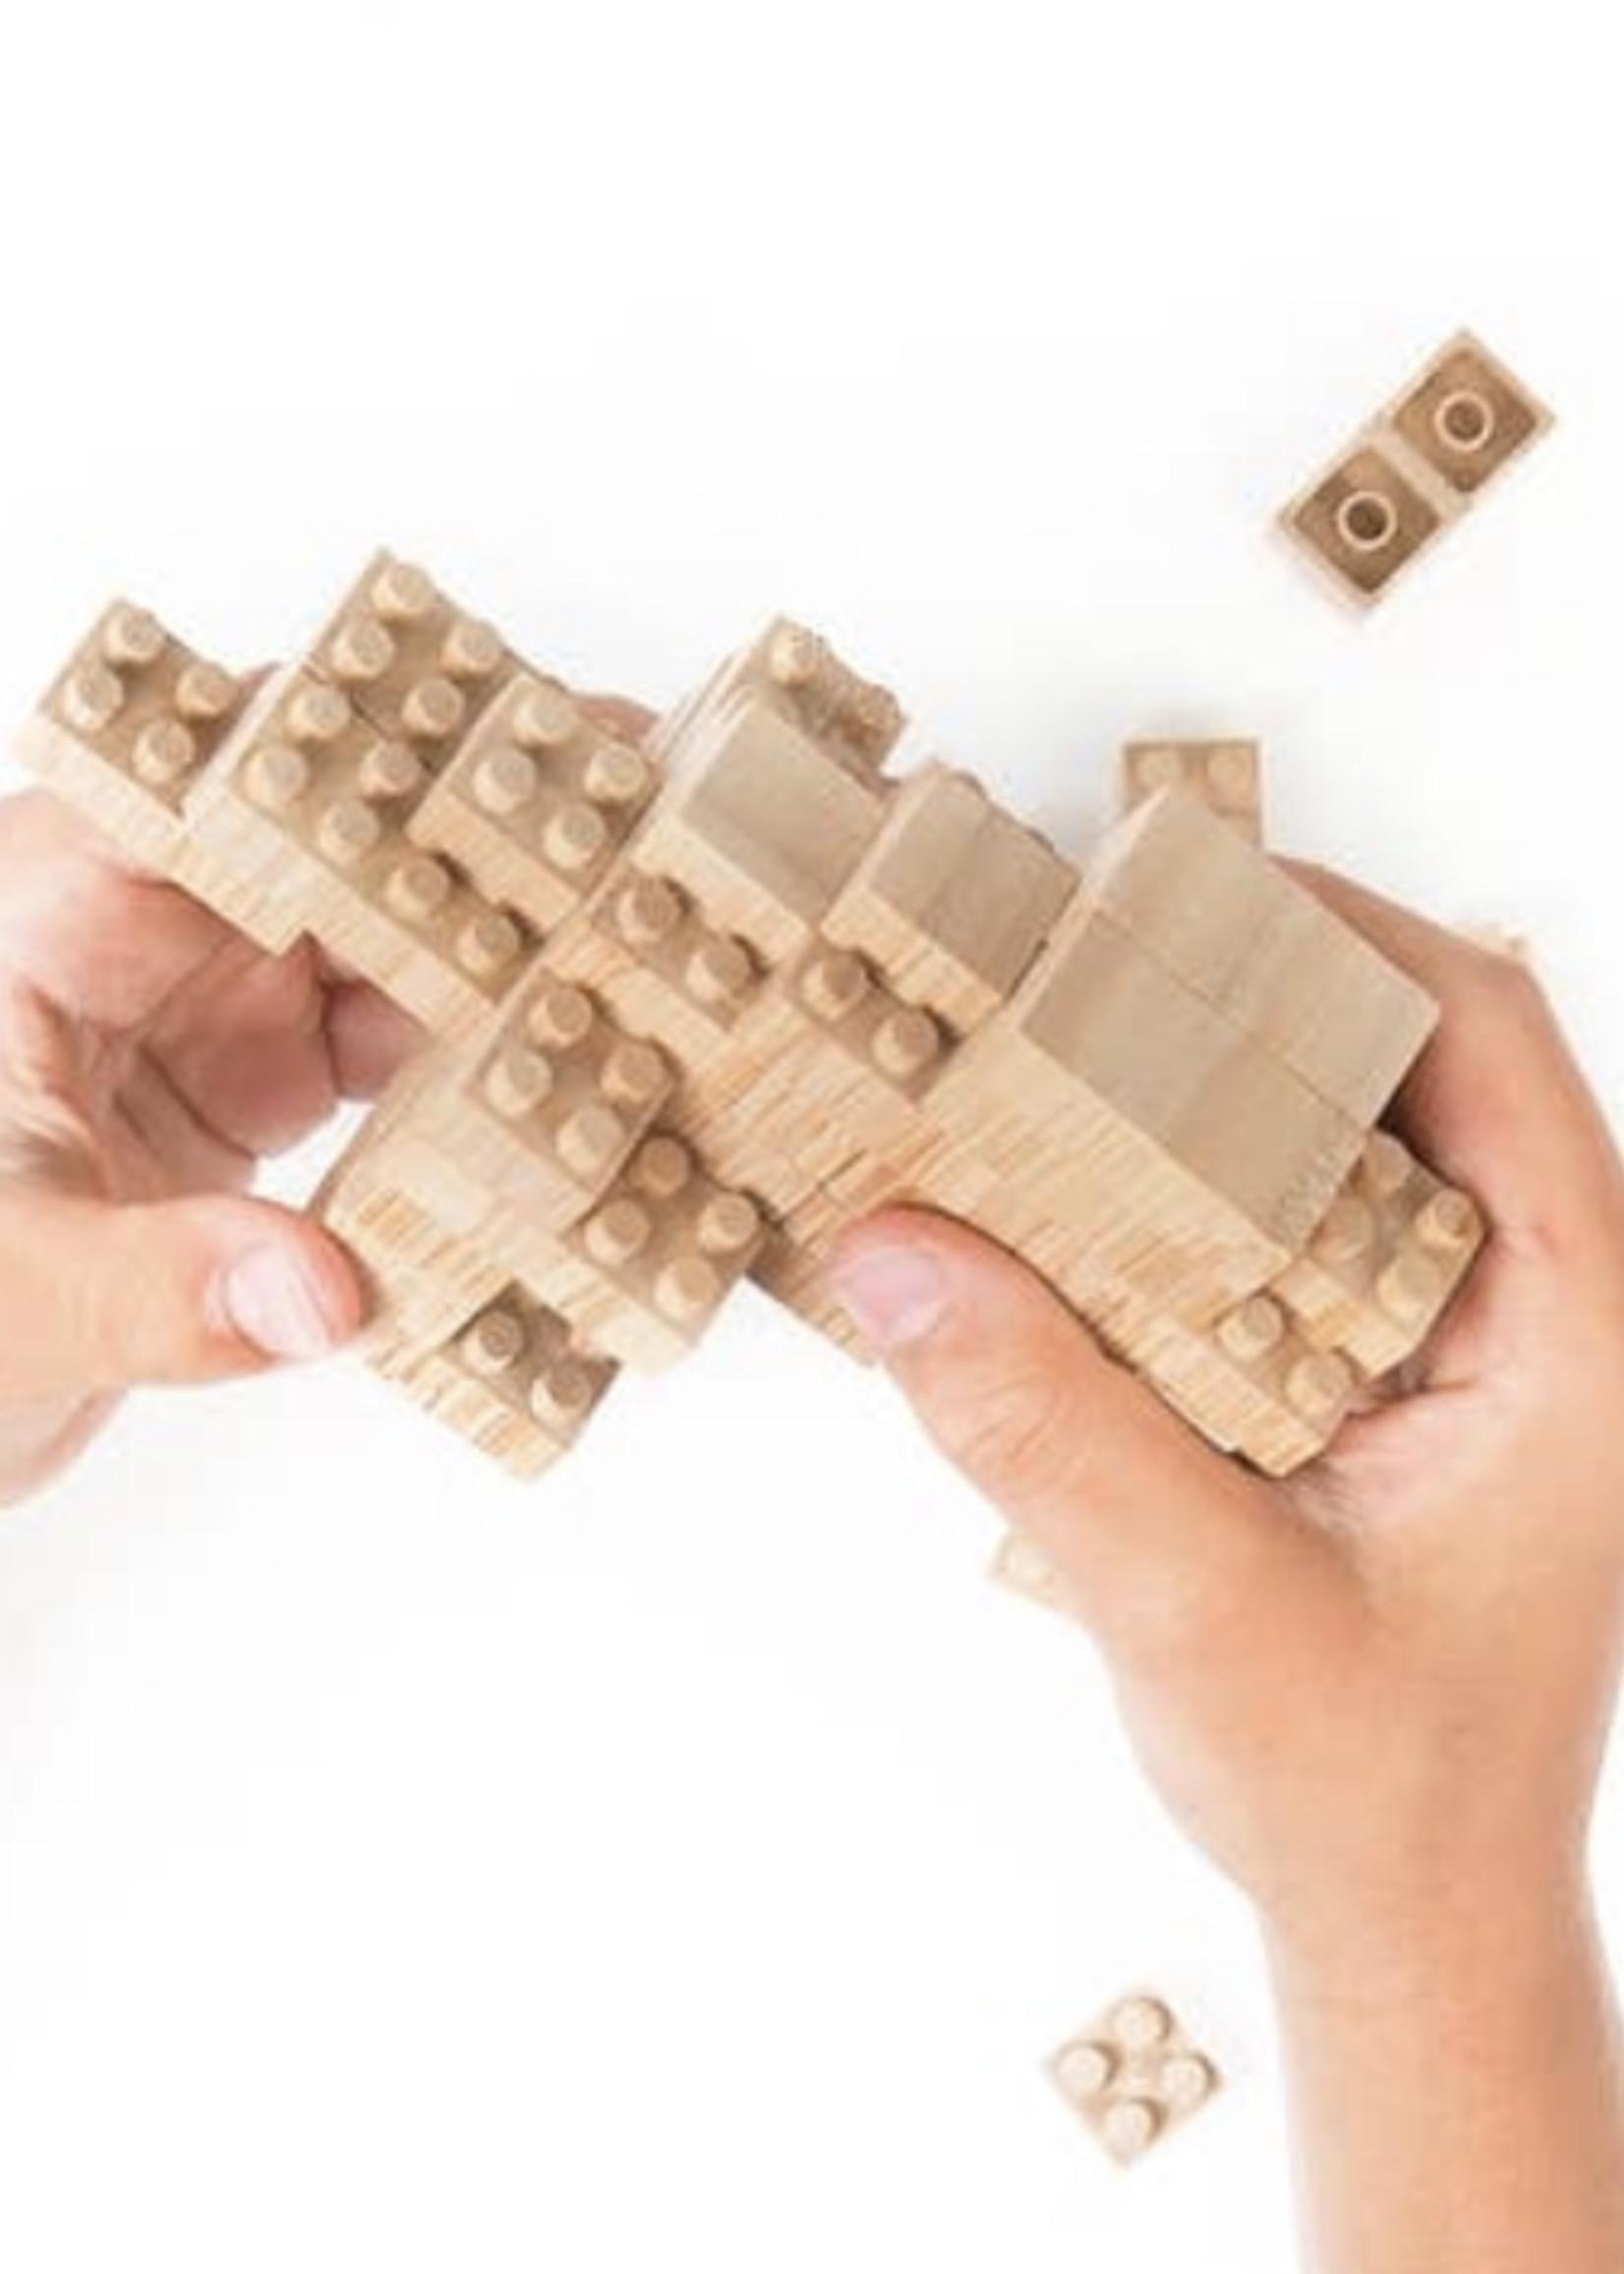 The Lazy Dog & Co Eco-bricks 45 Piece